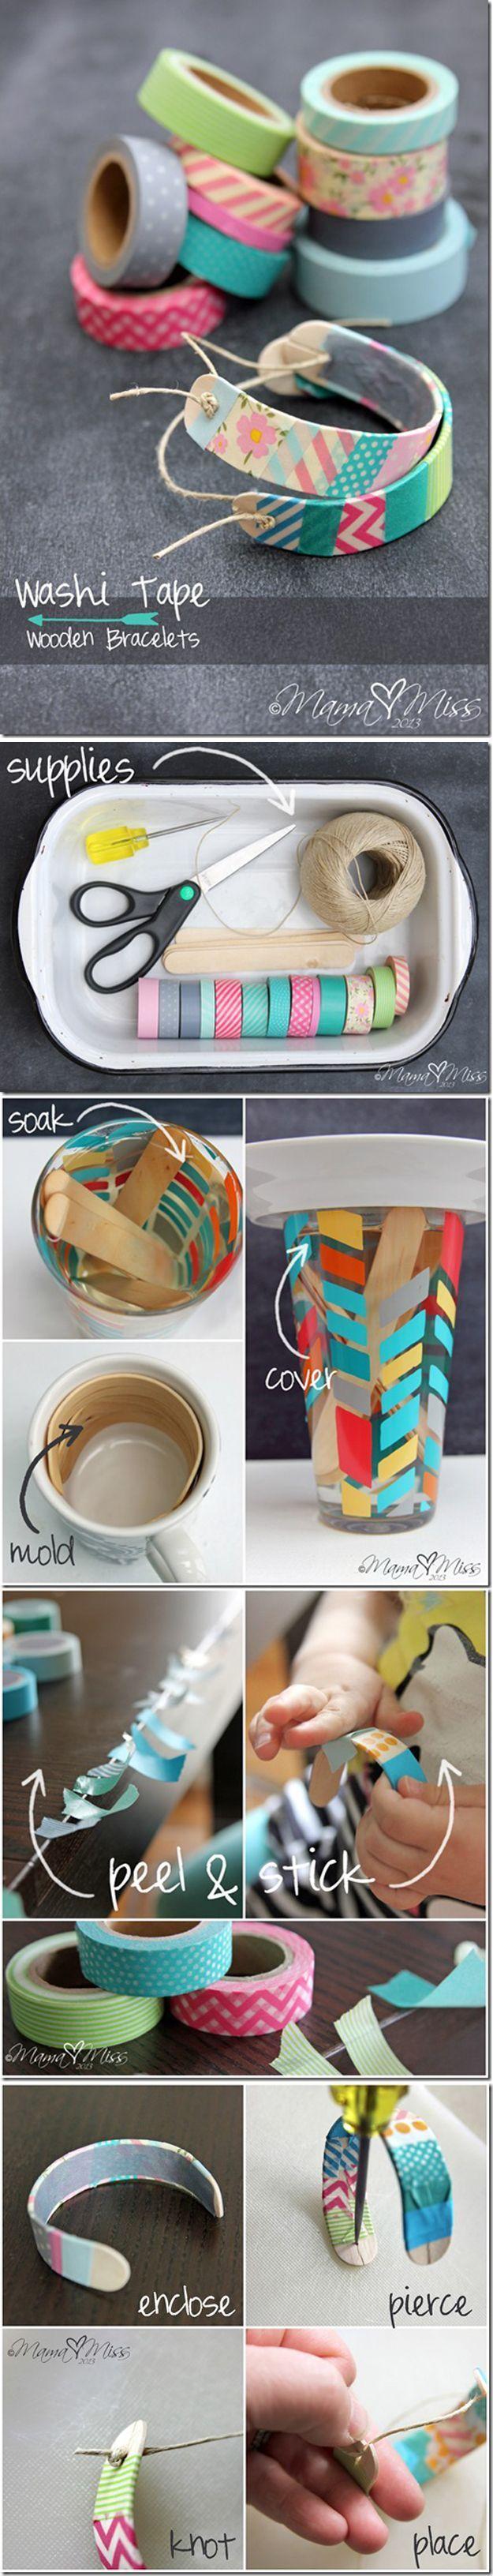 DIY Washi Tape Jewelry | Washi Tape Wooden Bracelets by DIY Ready at http://diyready.com/100-creative-ways-to-use-washi-tape/